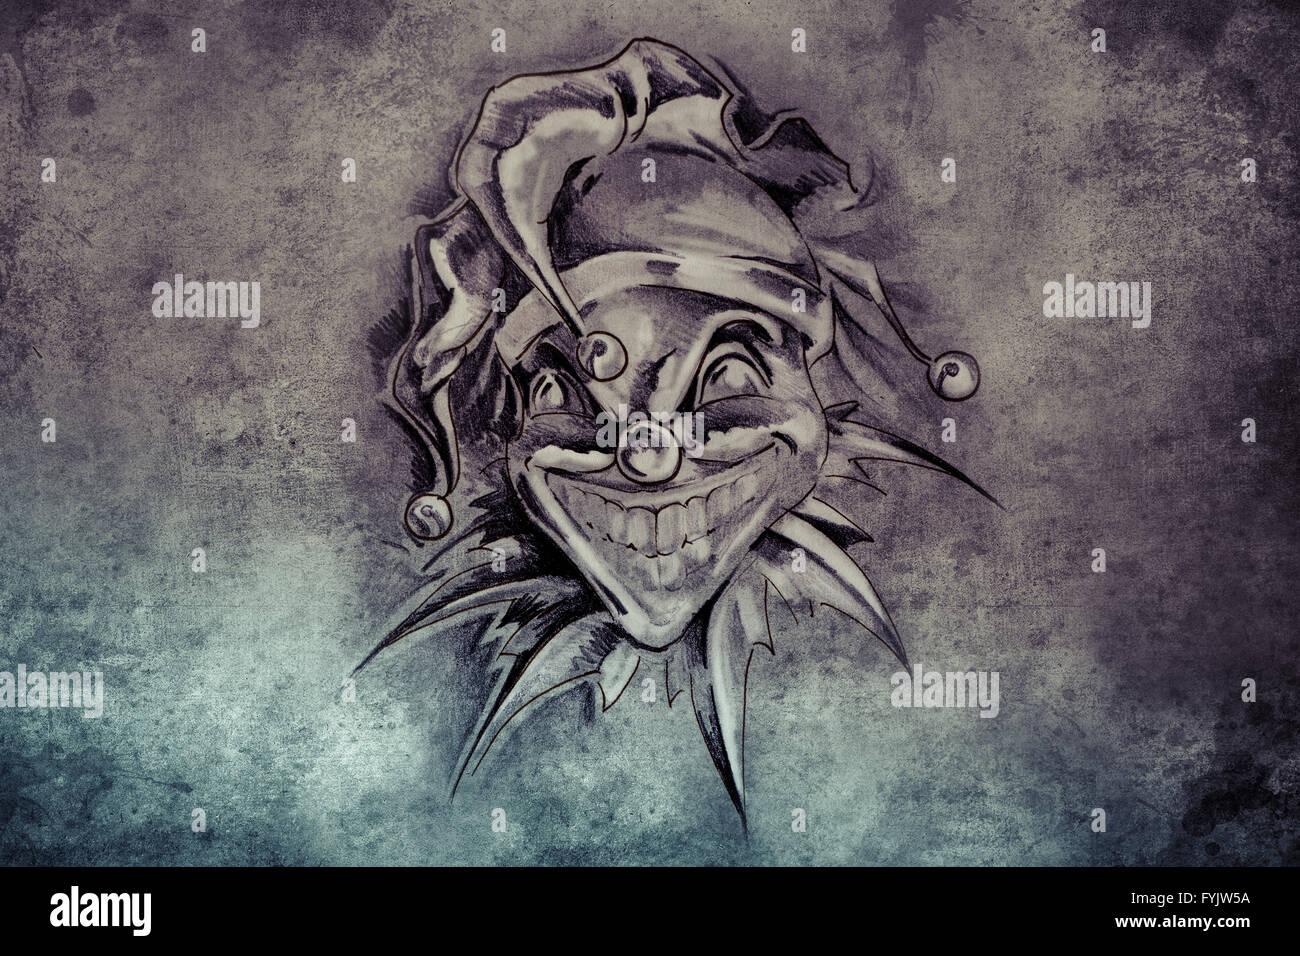 Tattoo Joker Illustration Handmade Draw Over Vintage Paper Stock